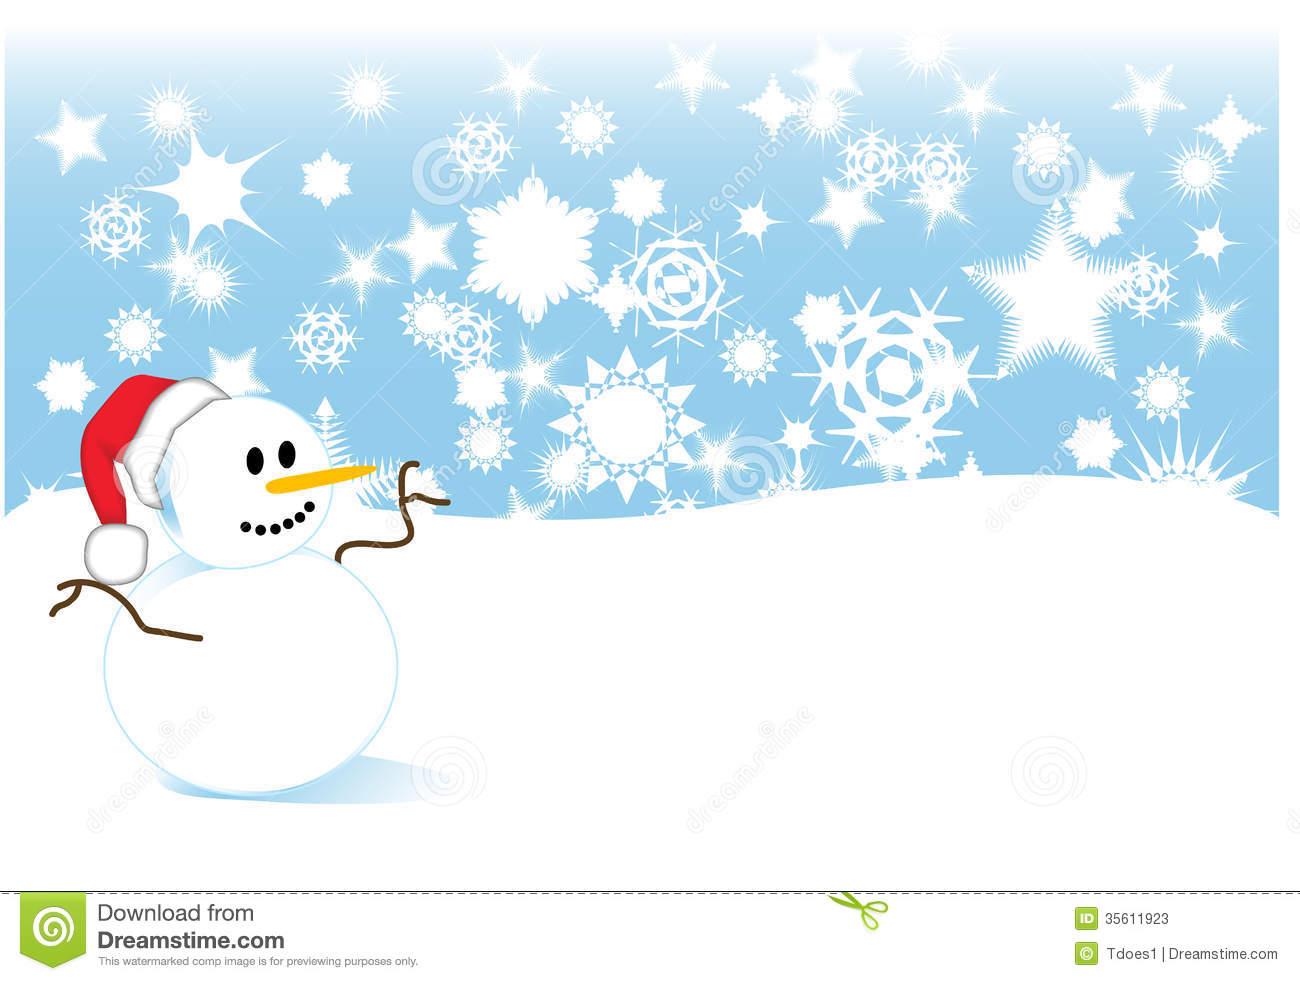 Snow Storm Clip Art Snowman In Snowstorm #8SKaM5.